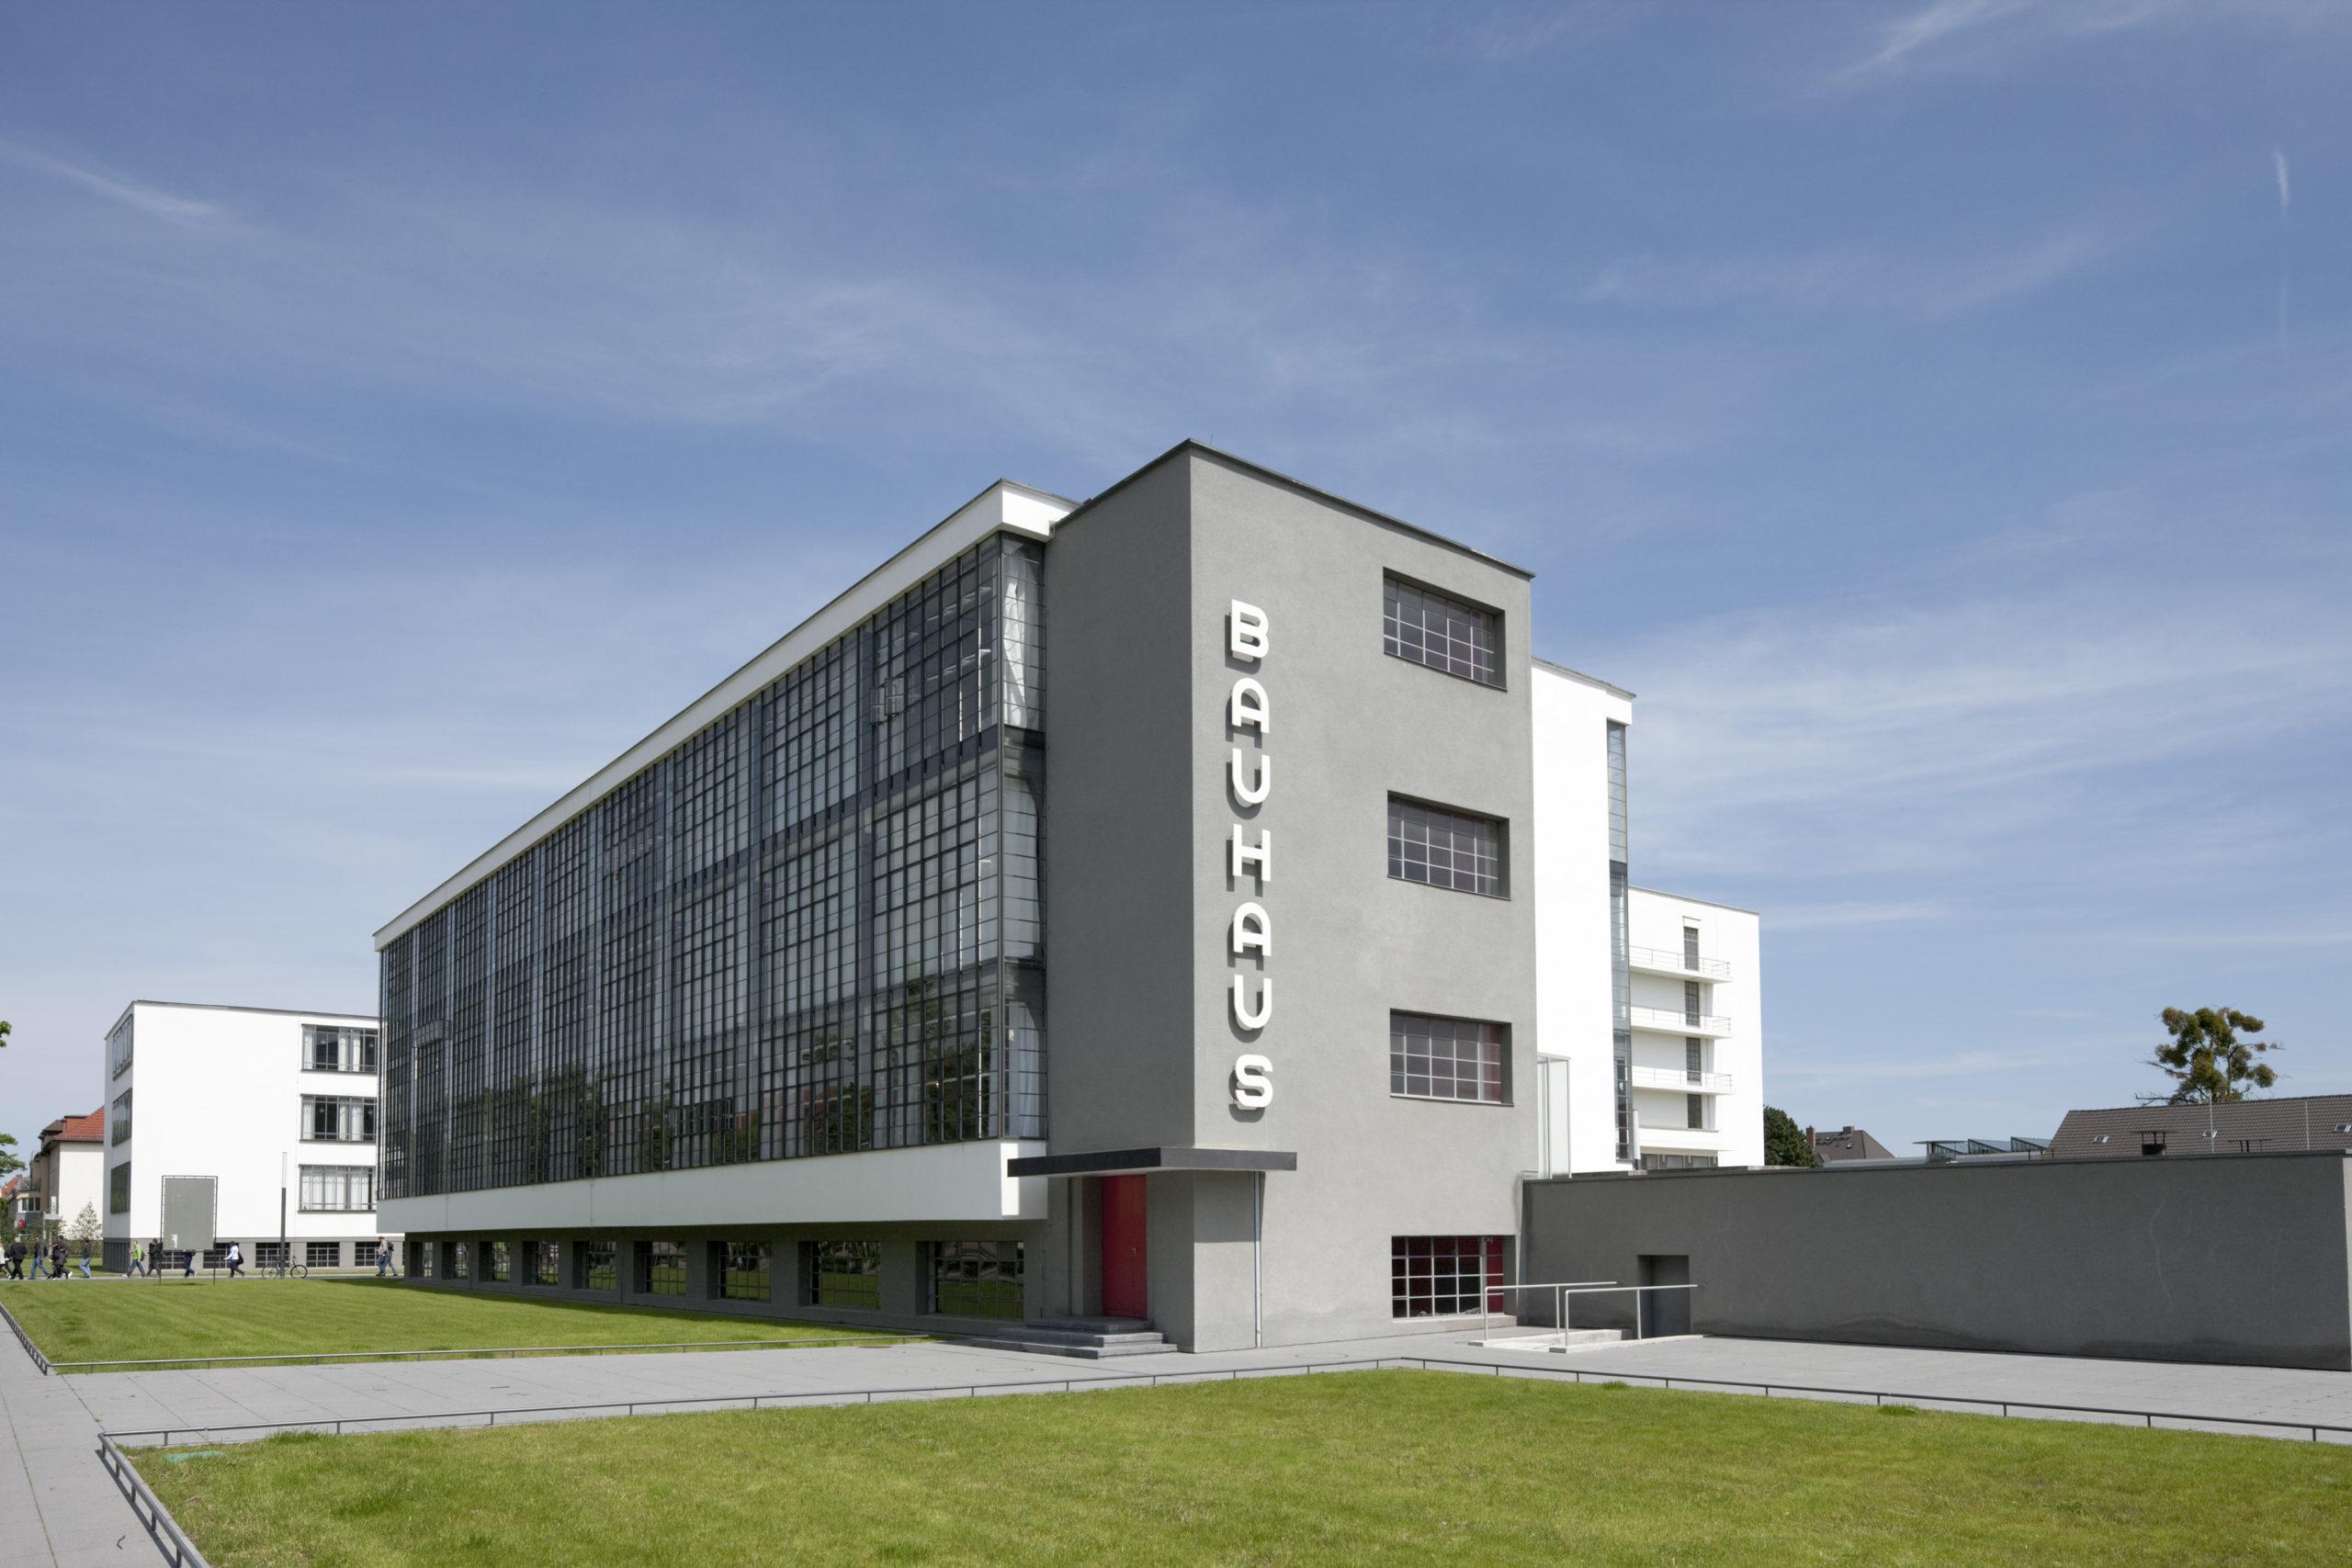 Bauhausgebäude Dessau, Walter Gropius. © Tadashi Okochi, Pen Magazine, 2010, Stiftung Bauhaus Dessau